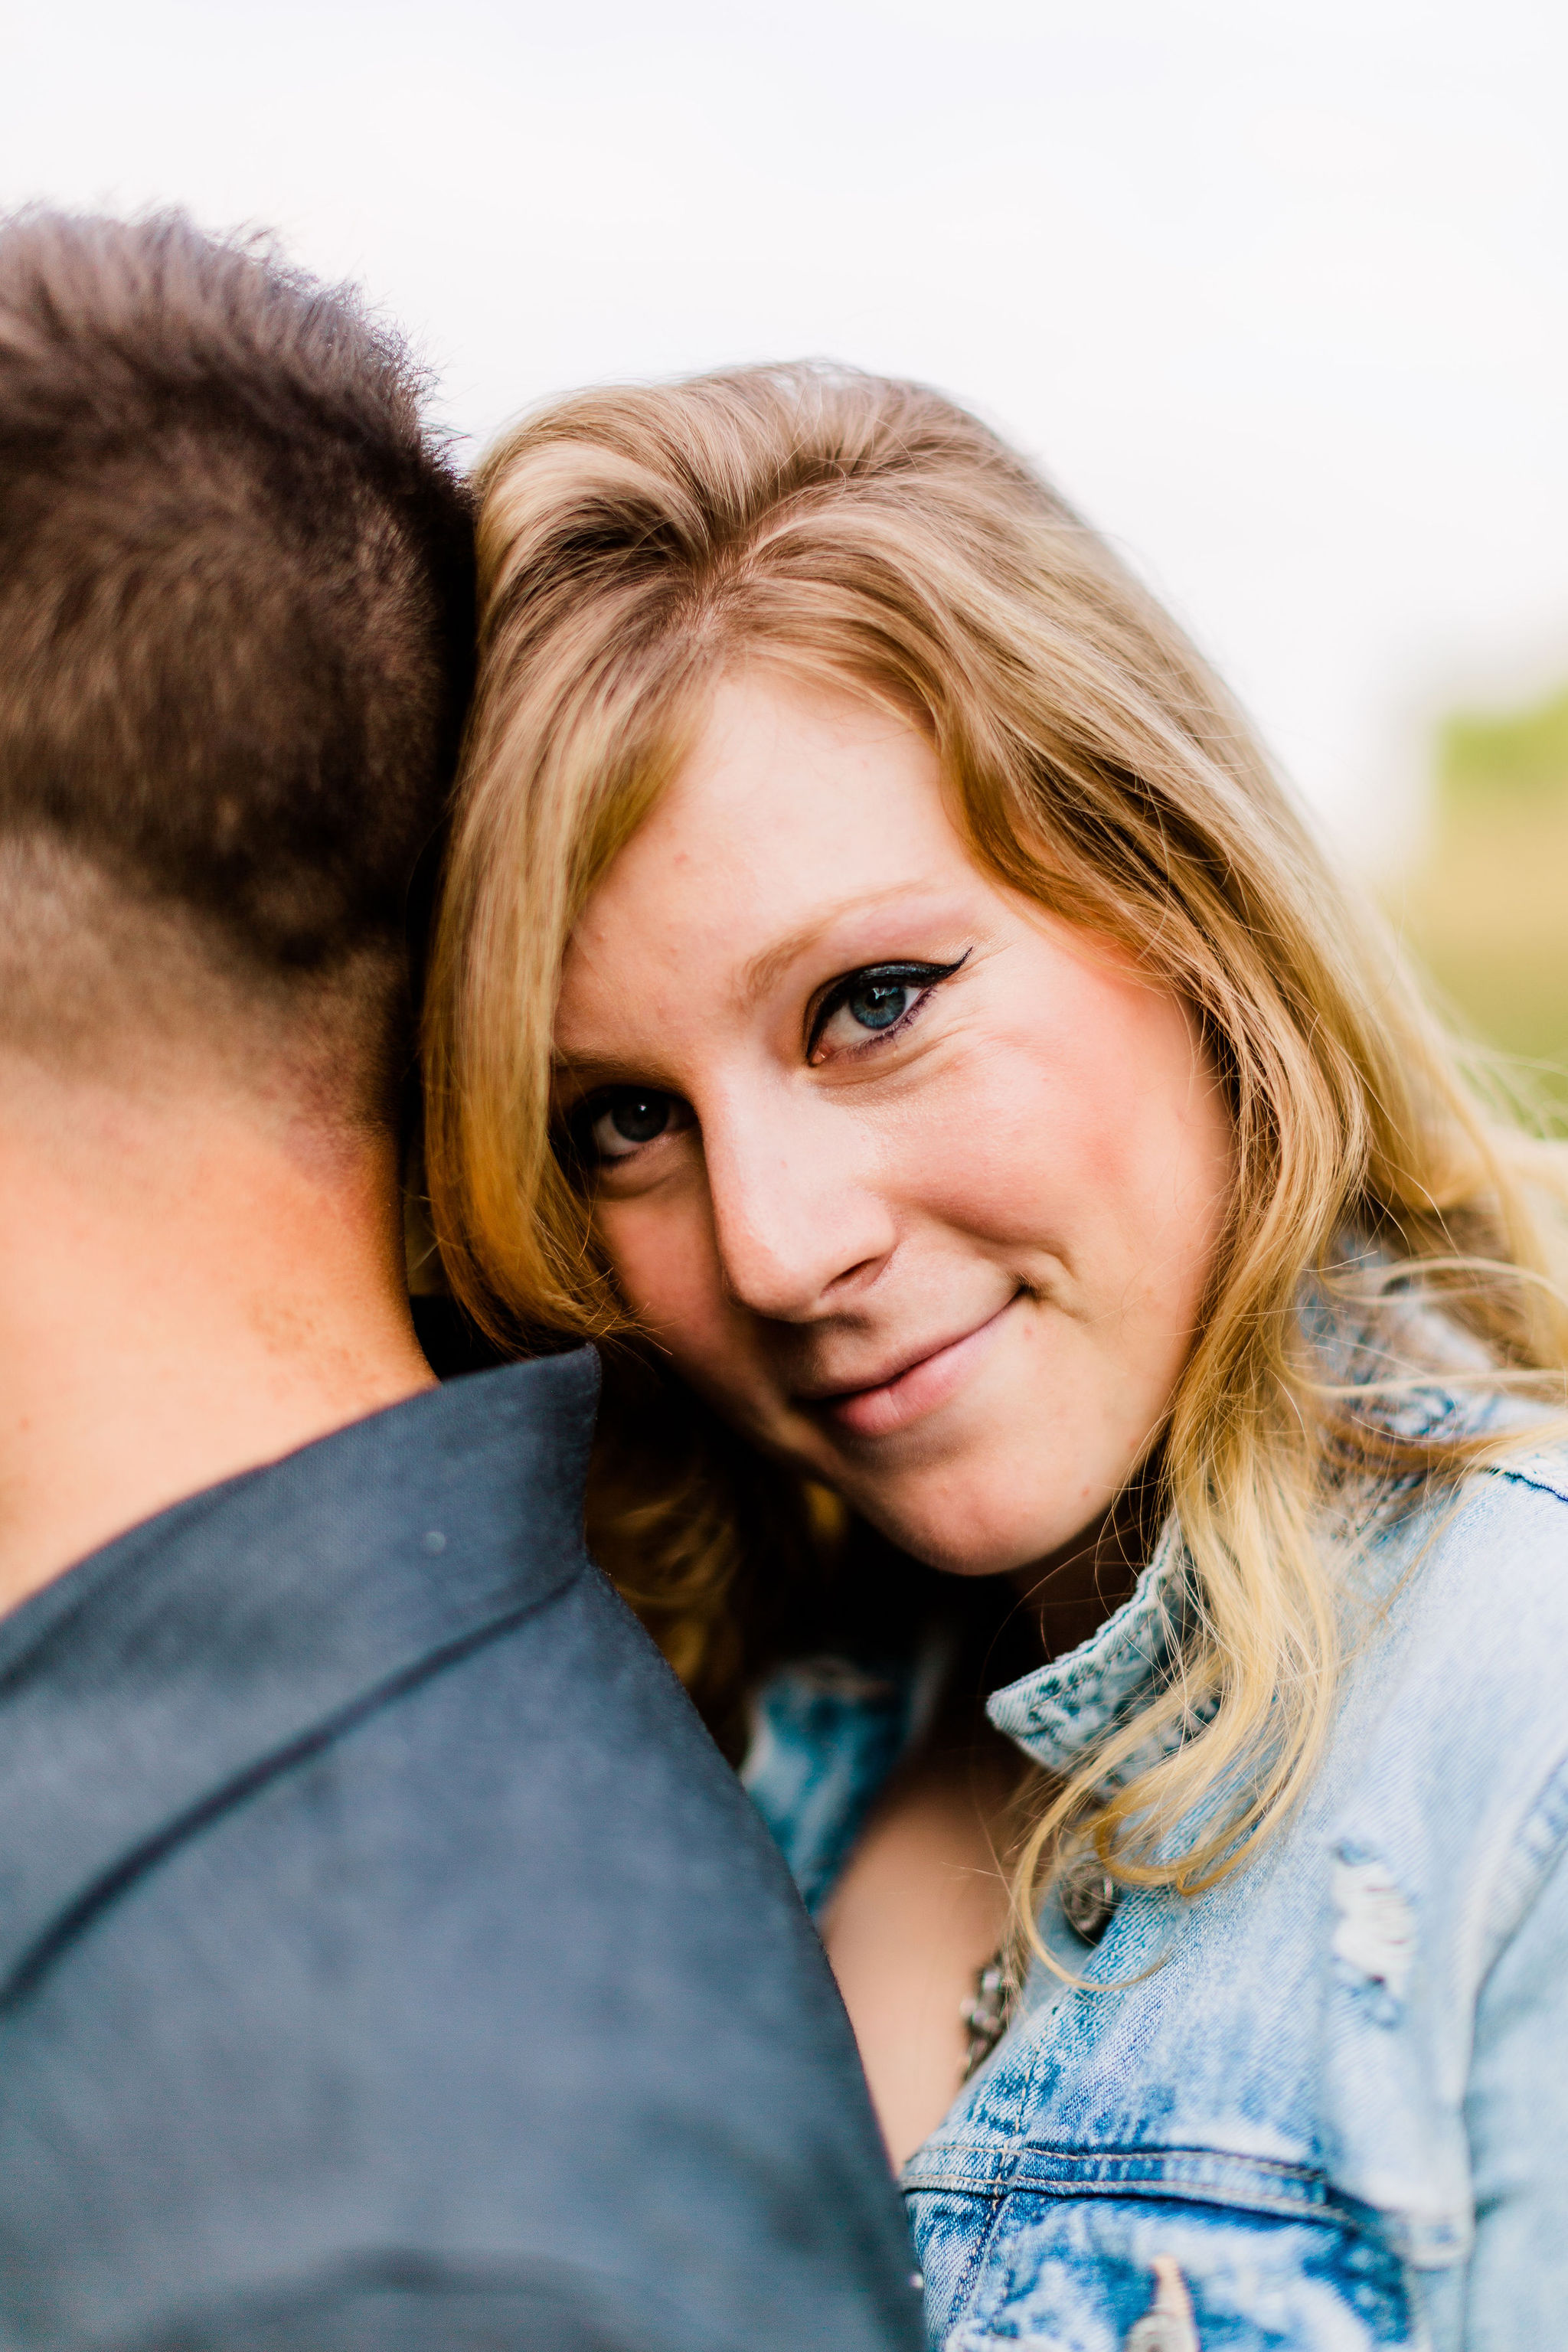 katie_graham_photography_bemus_point_wedding_photography_Photographer_jamestown_new_york_lakewood_destination_elopement_wedding_photographer